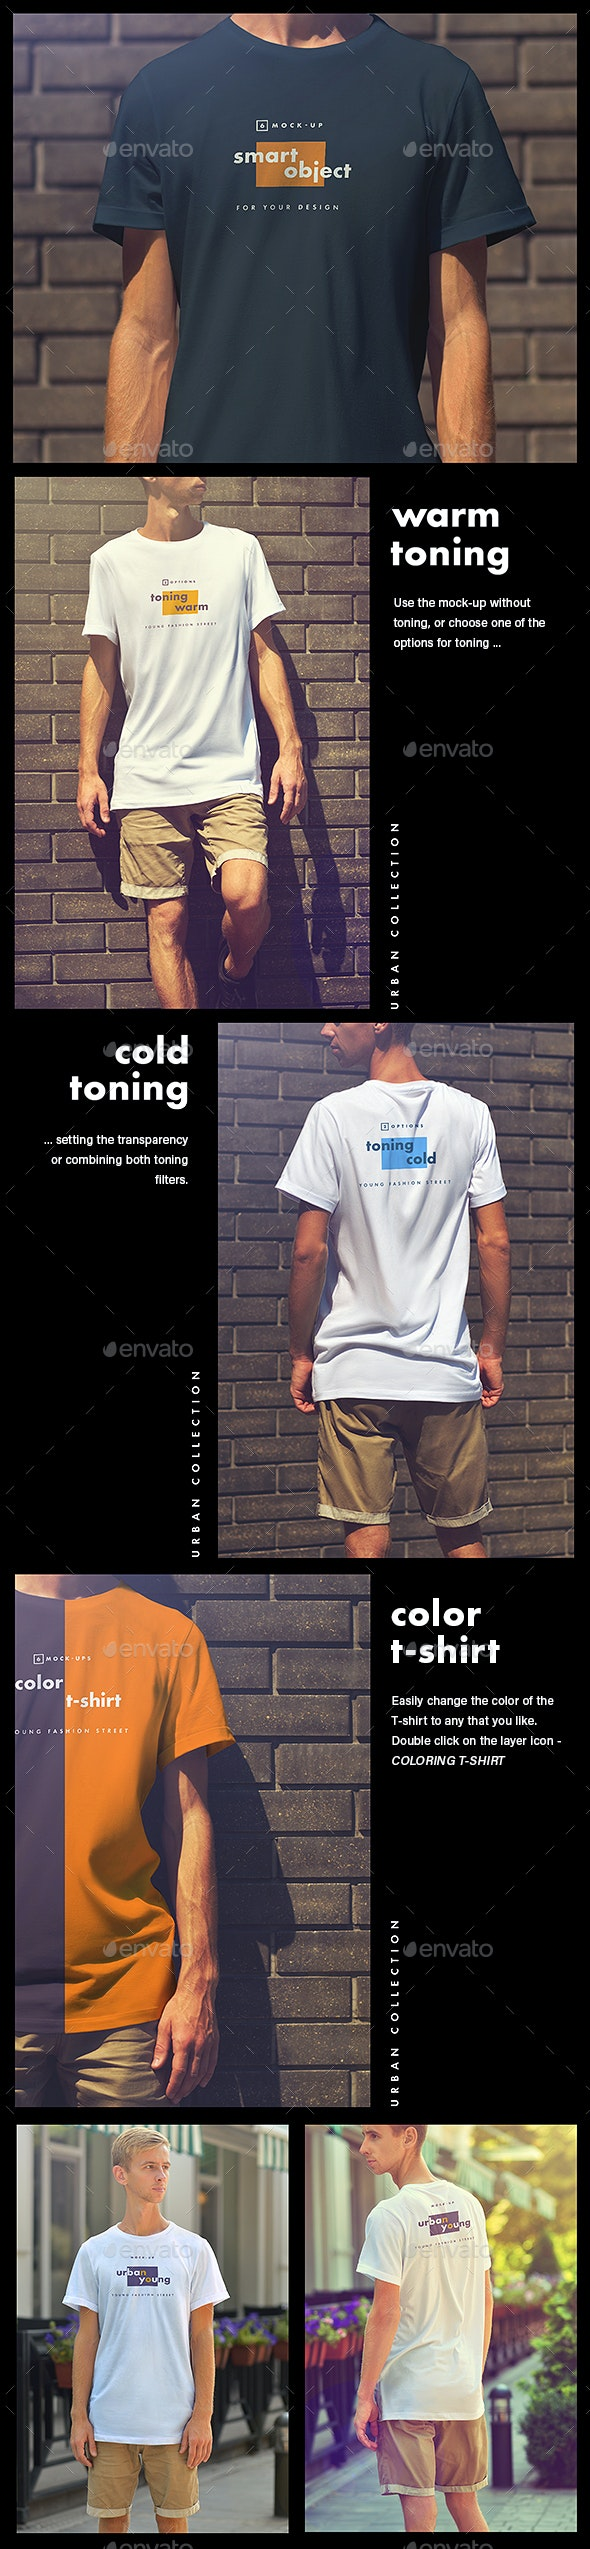 Mock-Ups T-Shirts Urban Style - Product Mock-Ups Graphics